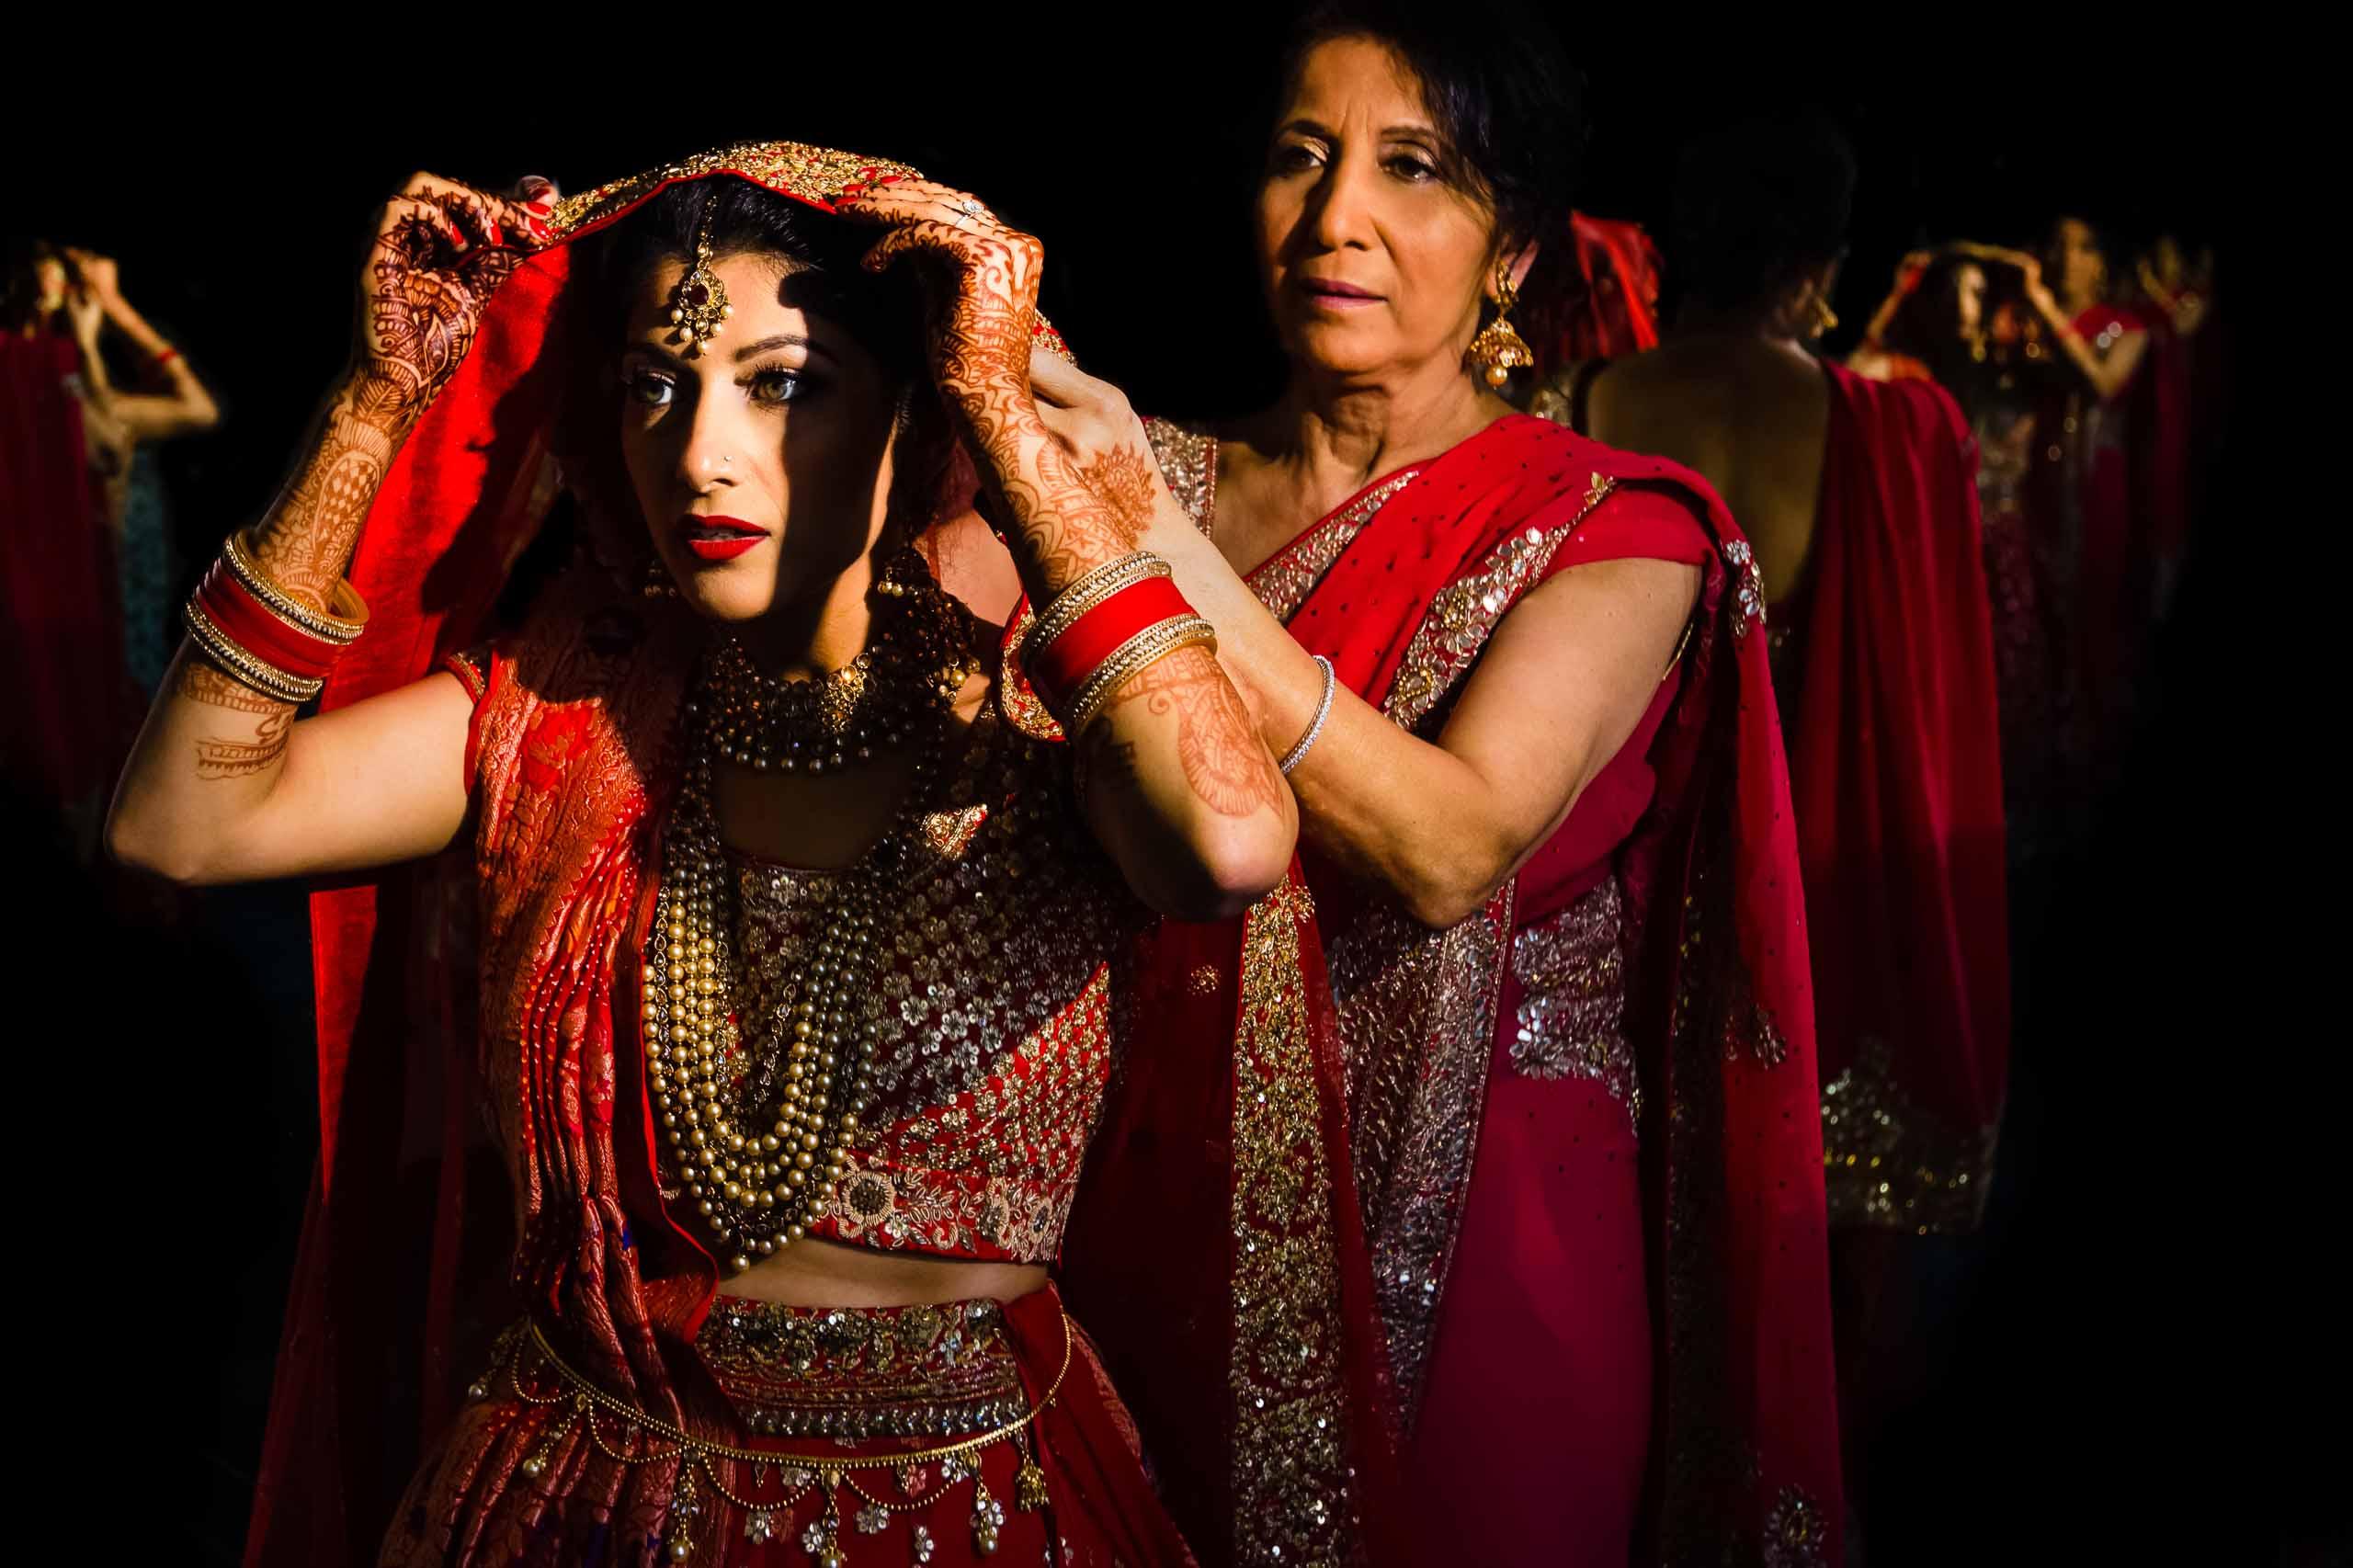 Beautiful Indian wedding getting ready for her Portland Art Museum wedding